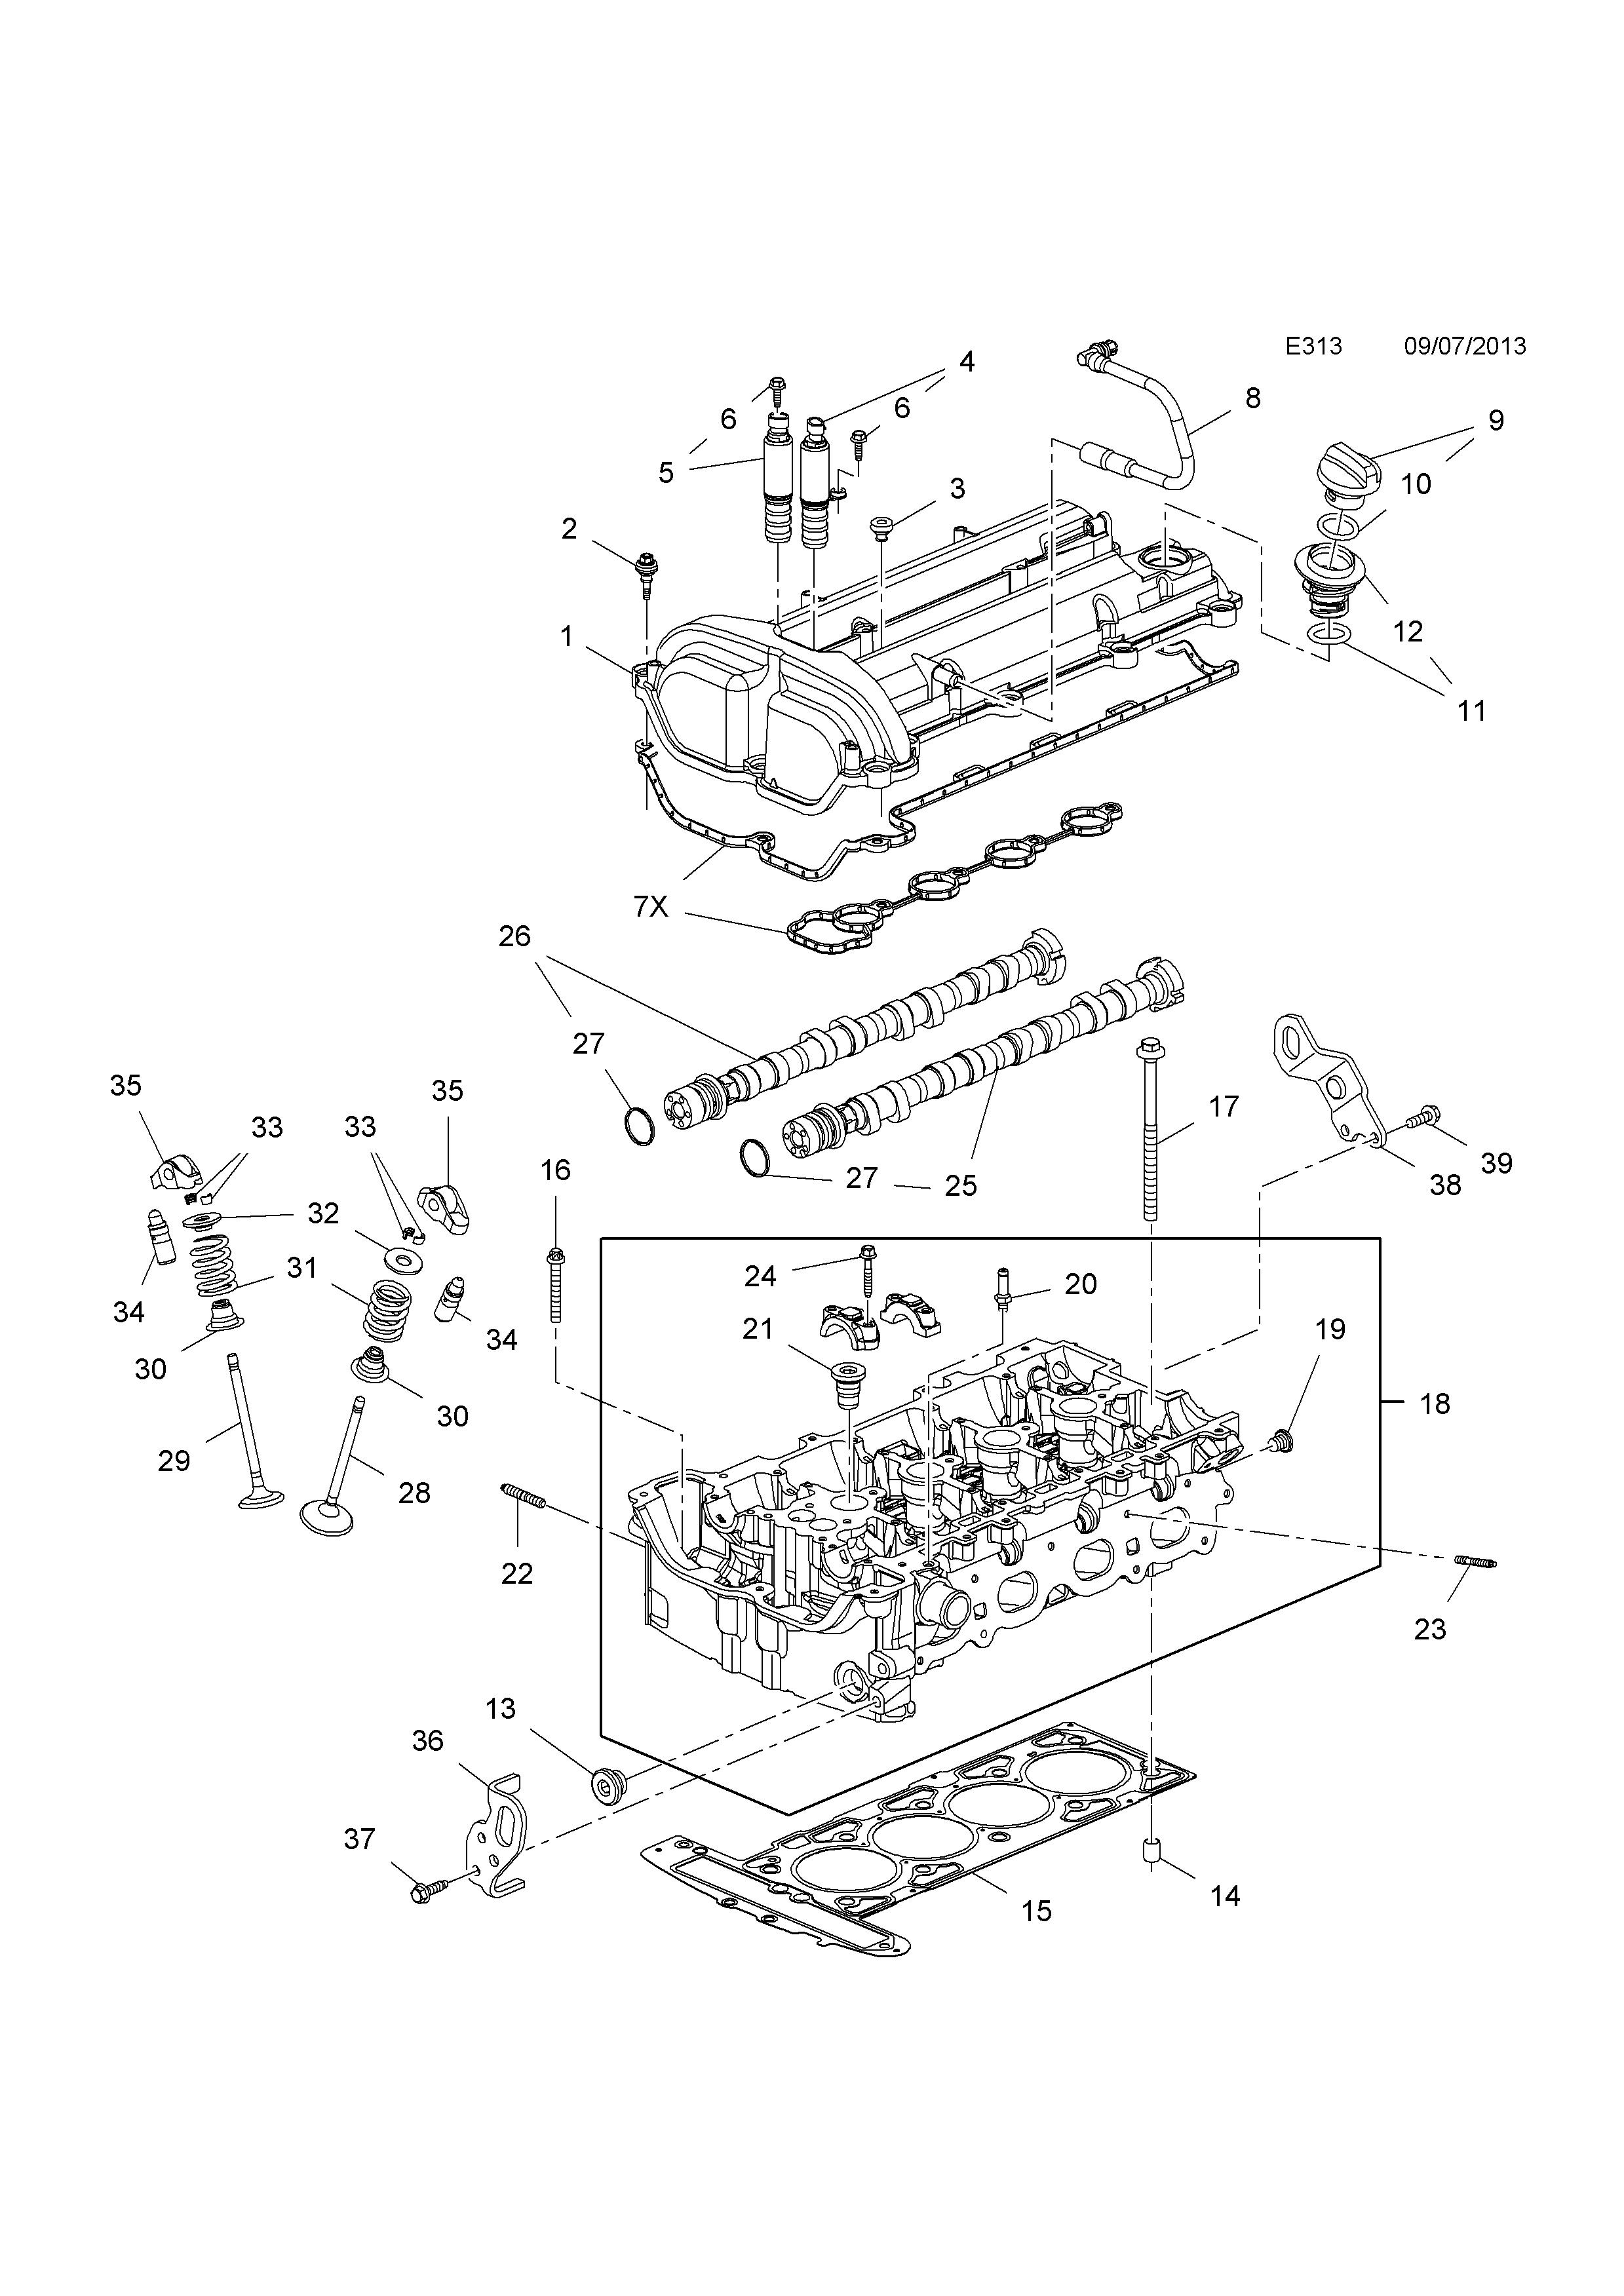 opel antara wiring diagram database 2009 Opel Antara opel antara 2007 e engine and clutch 2 a24xe le5 a24xf le9 opel antara 2018 dimensions